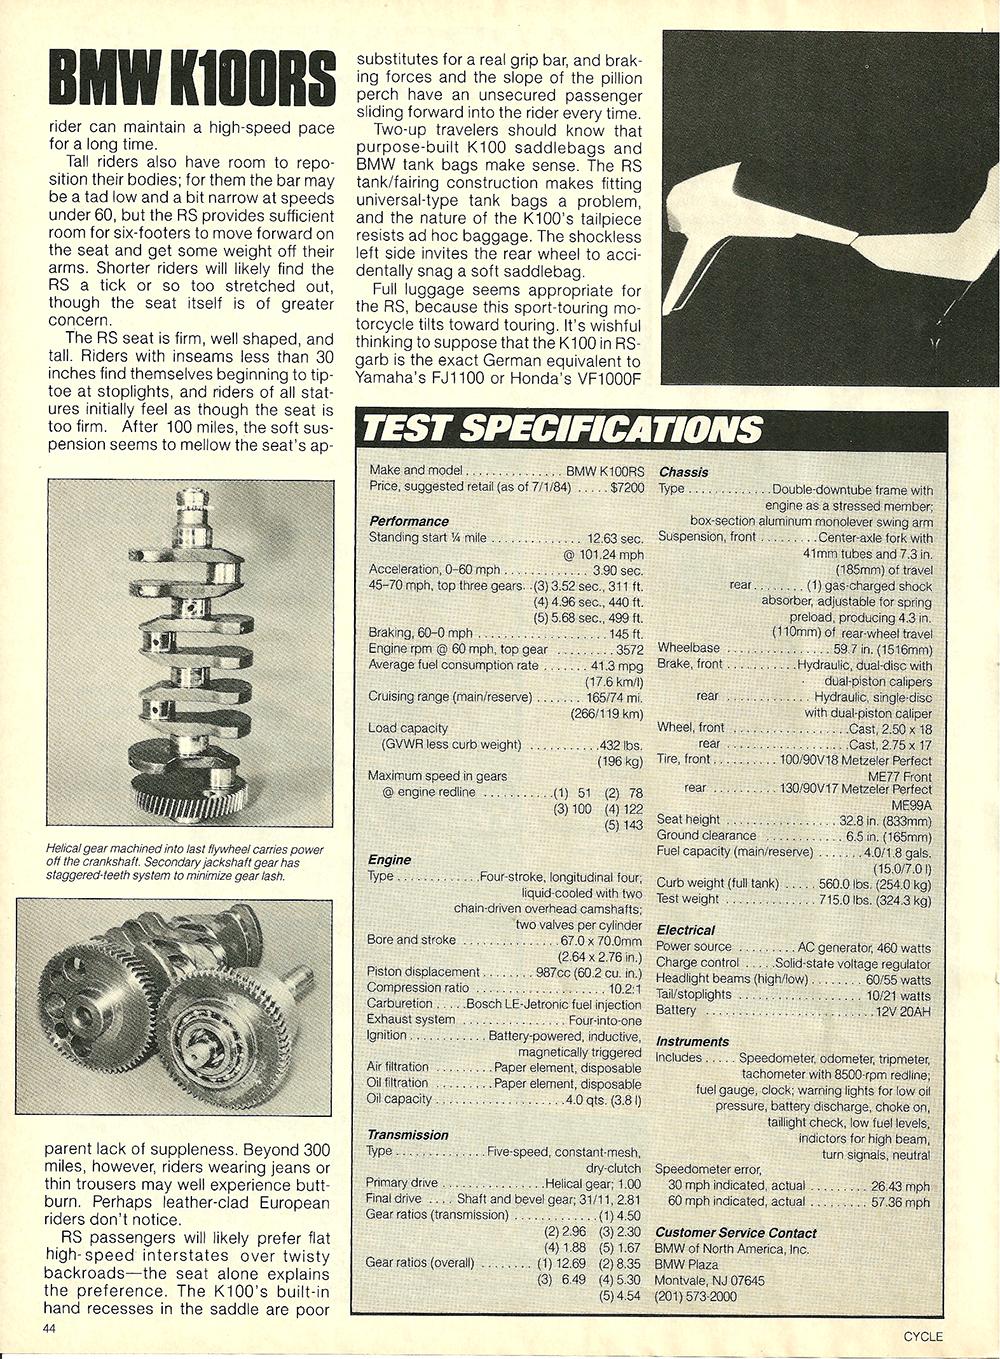 1984 BMW K100RS road test 09.jpg